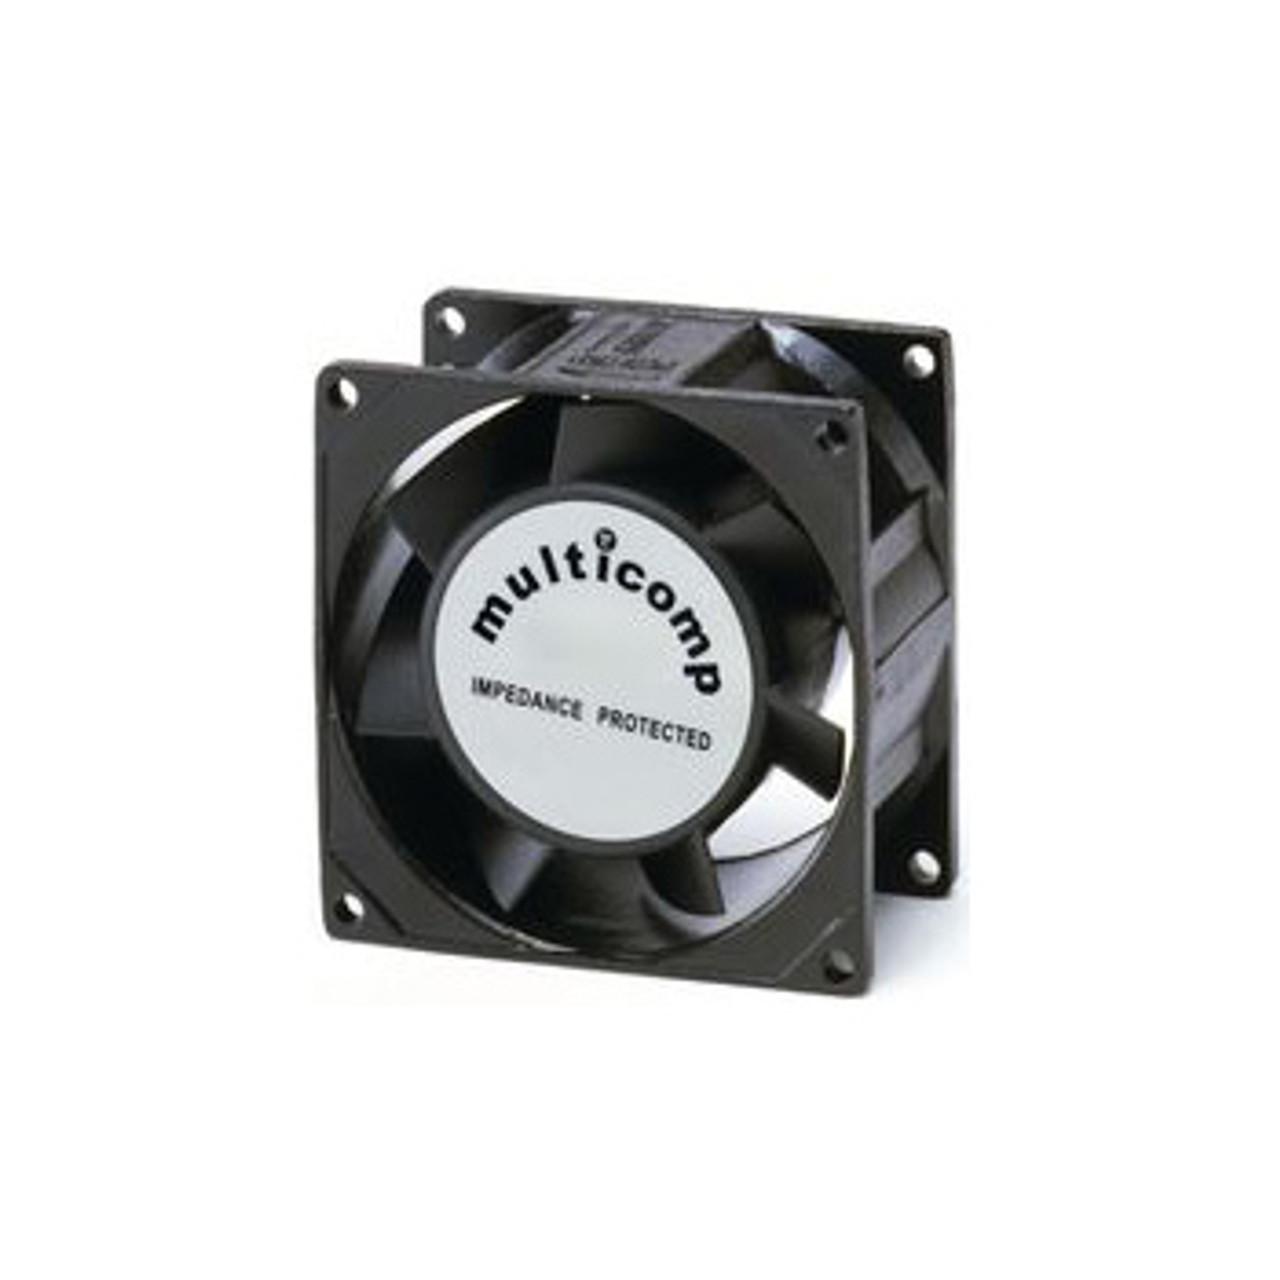 Muffin fan, 80mm, 115VAC, 50/60Hz Ultra-quiet